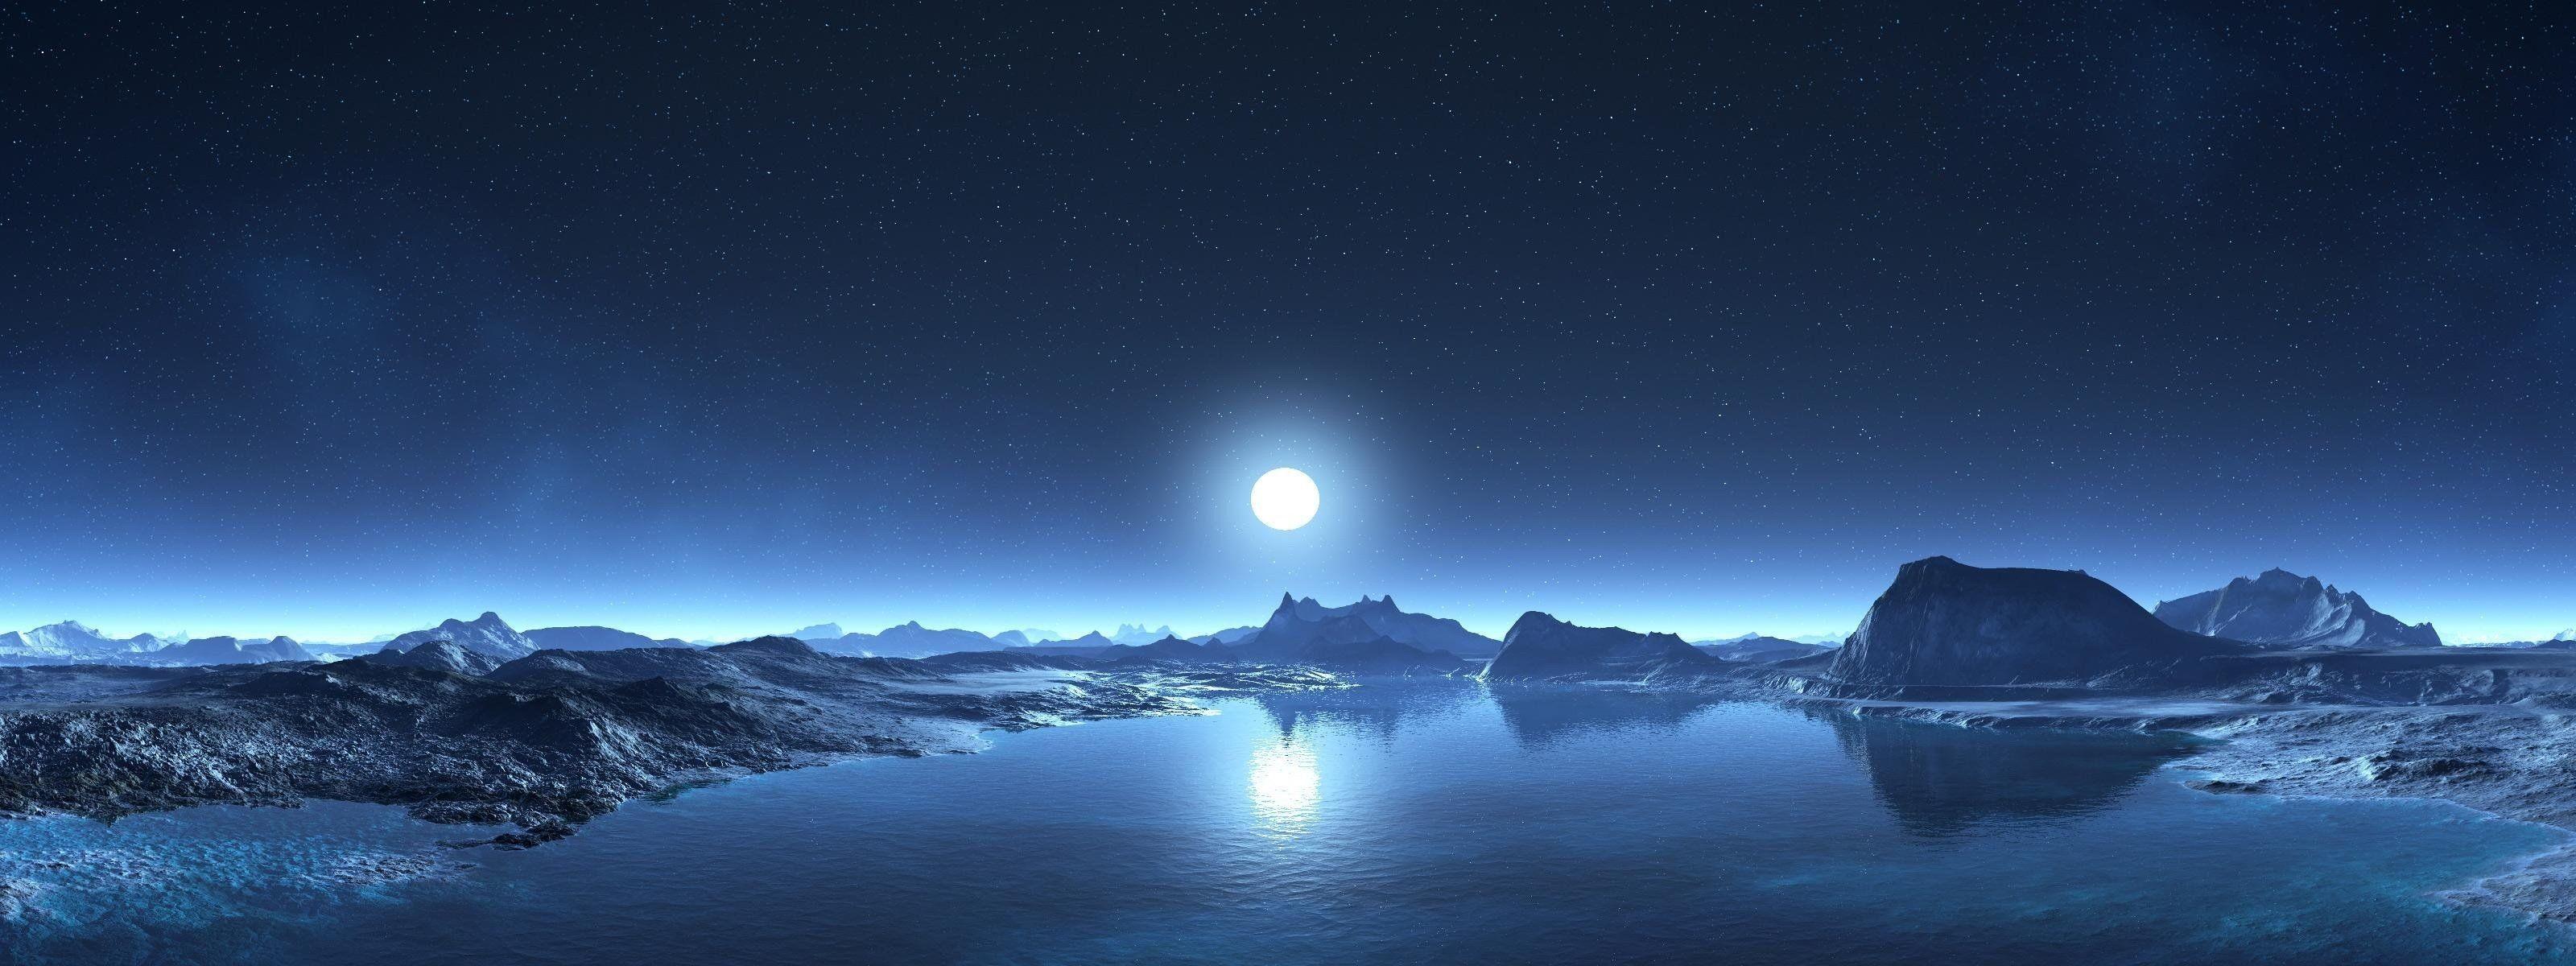 Res: 3200x1200, moon mountain water sky star beach HD wallpaper